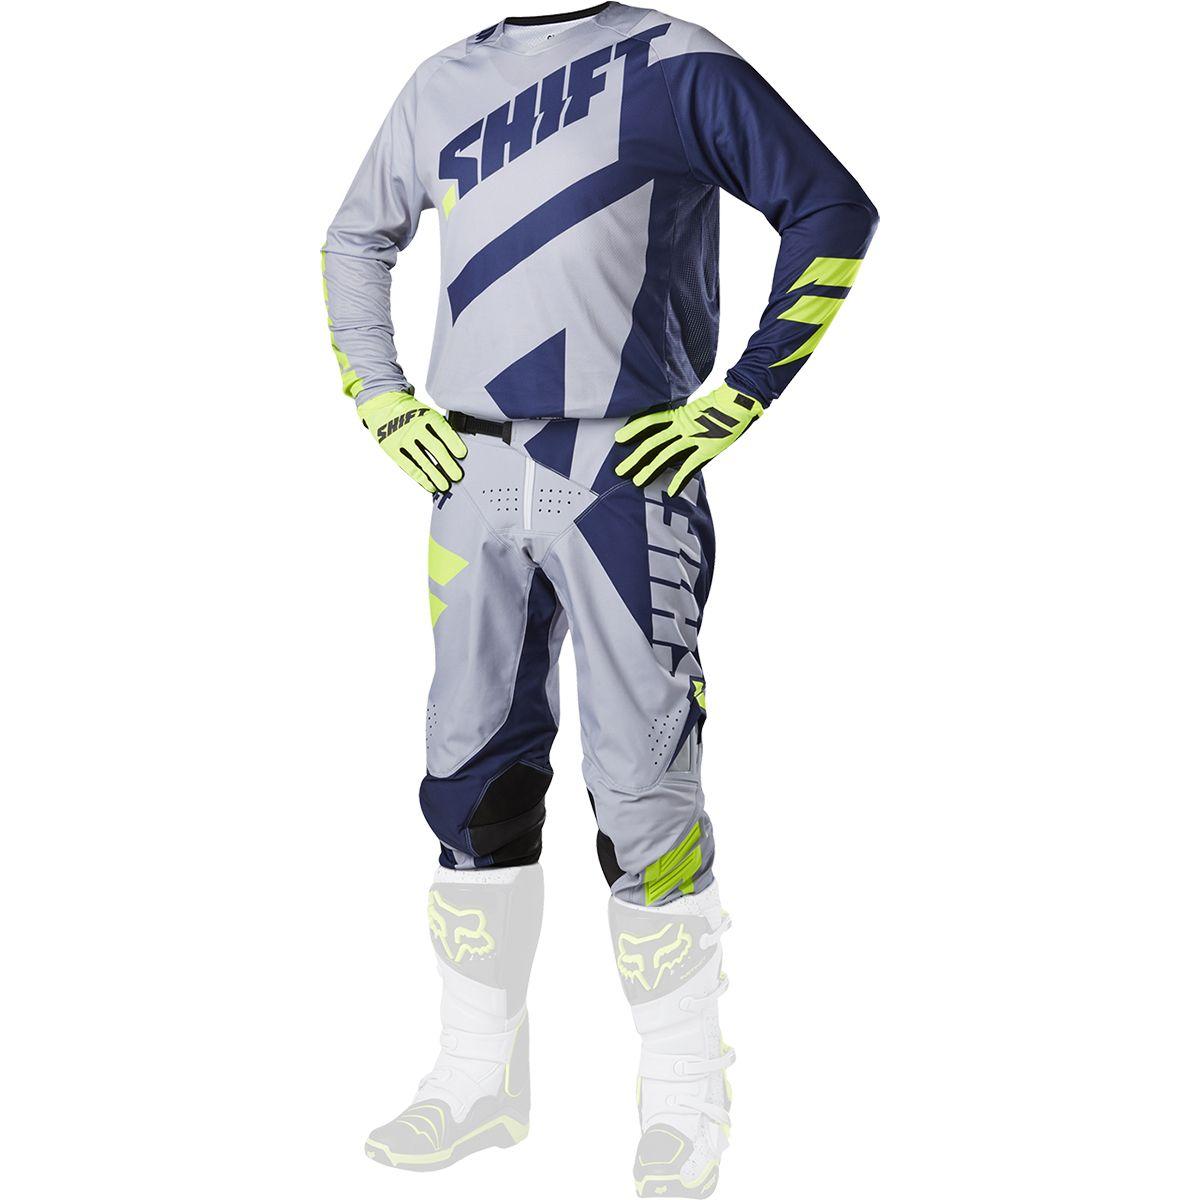 Shift - 2017 3LACK Mainline комплект штаны и джерси, серые